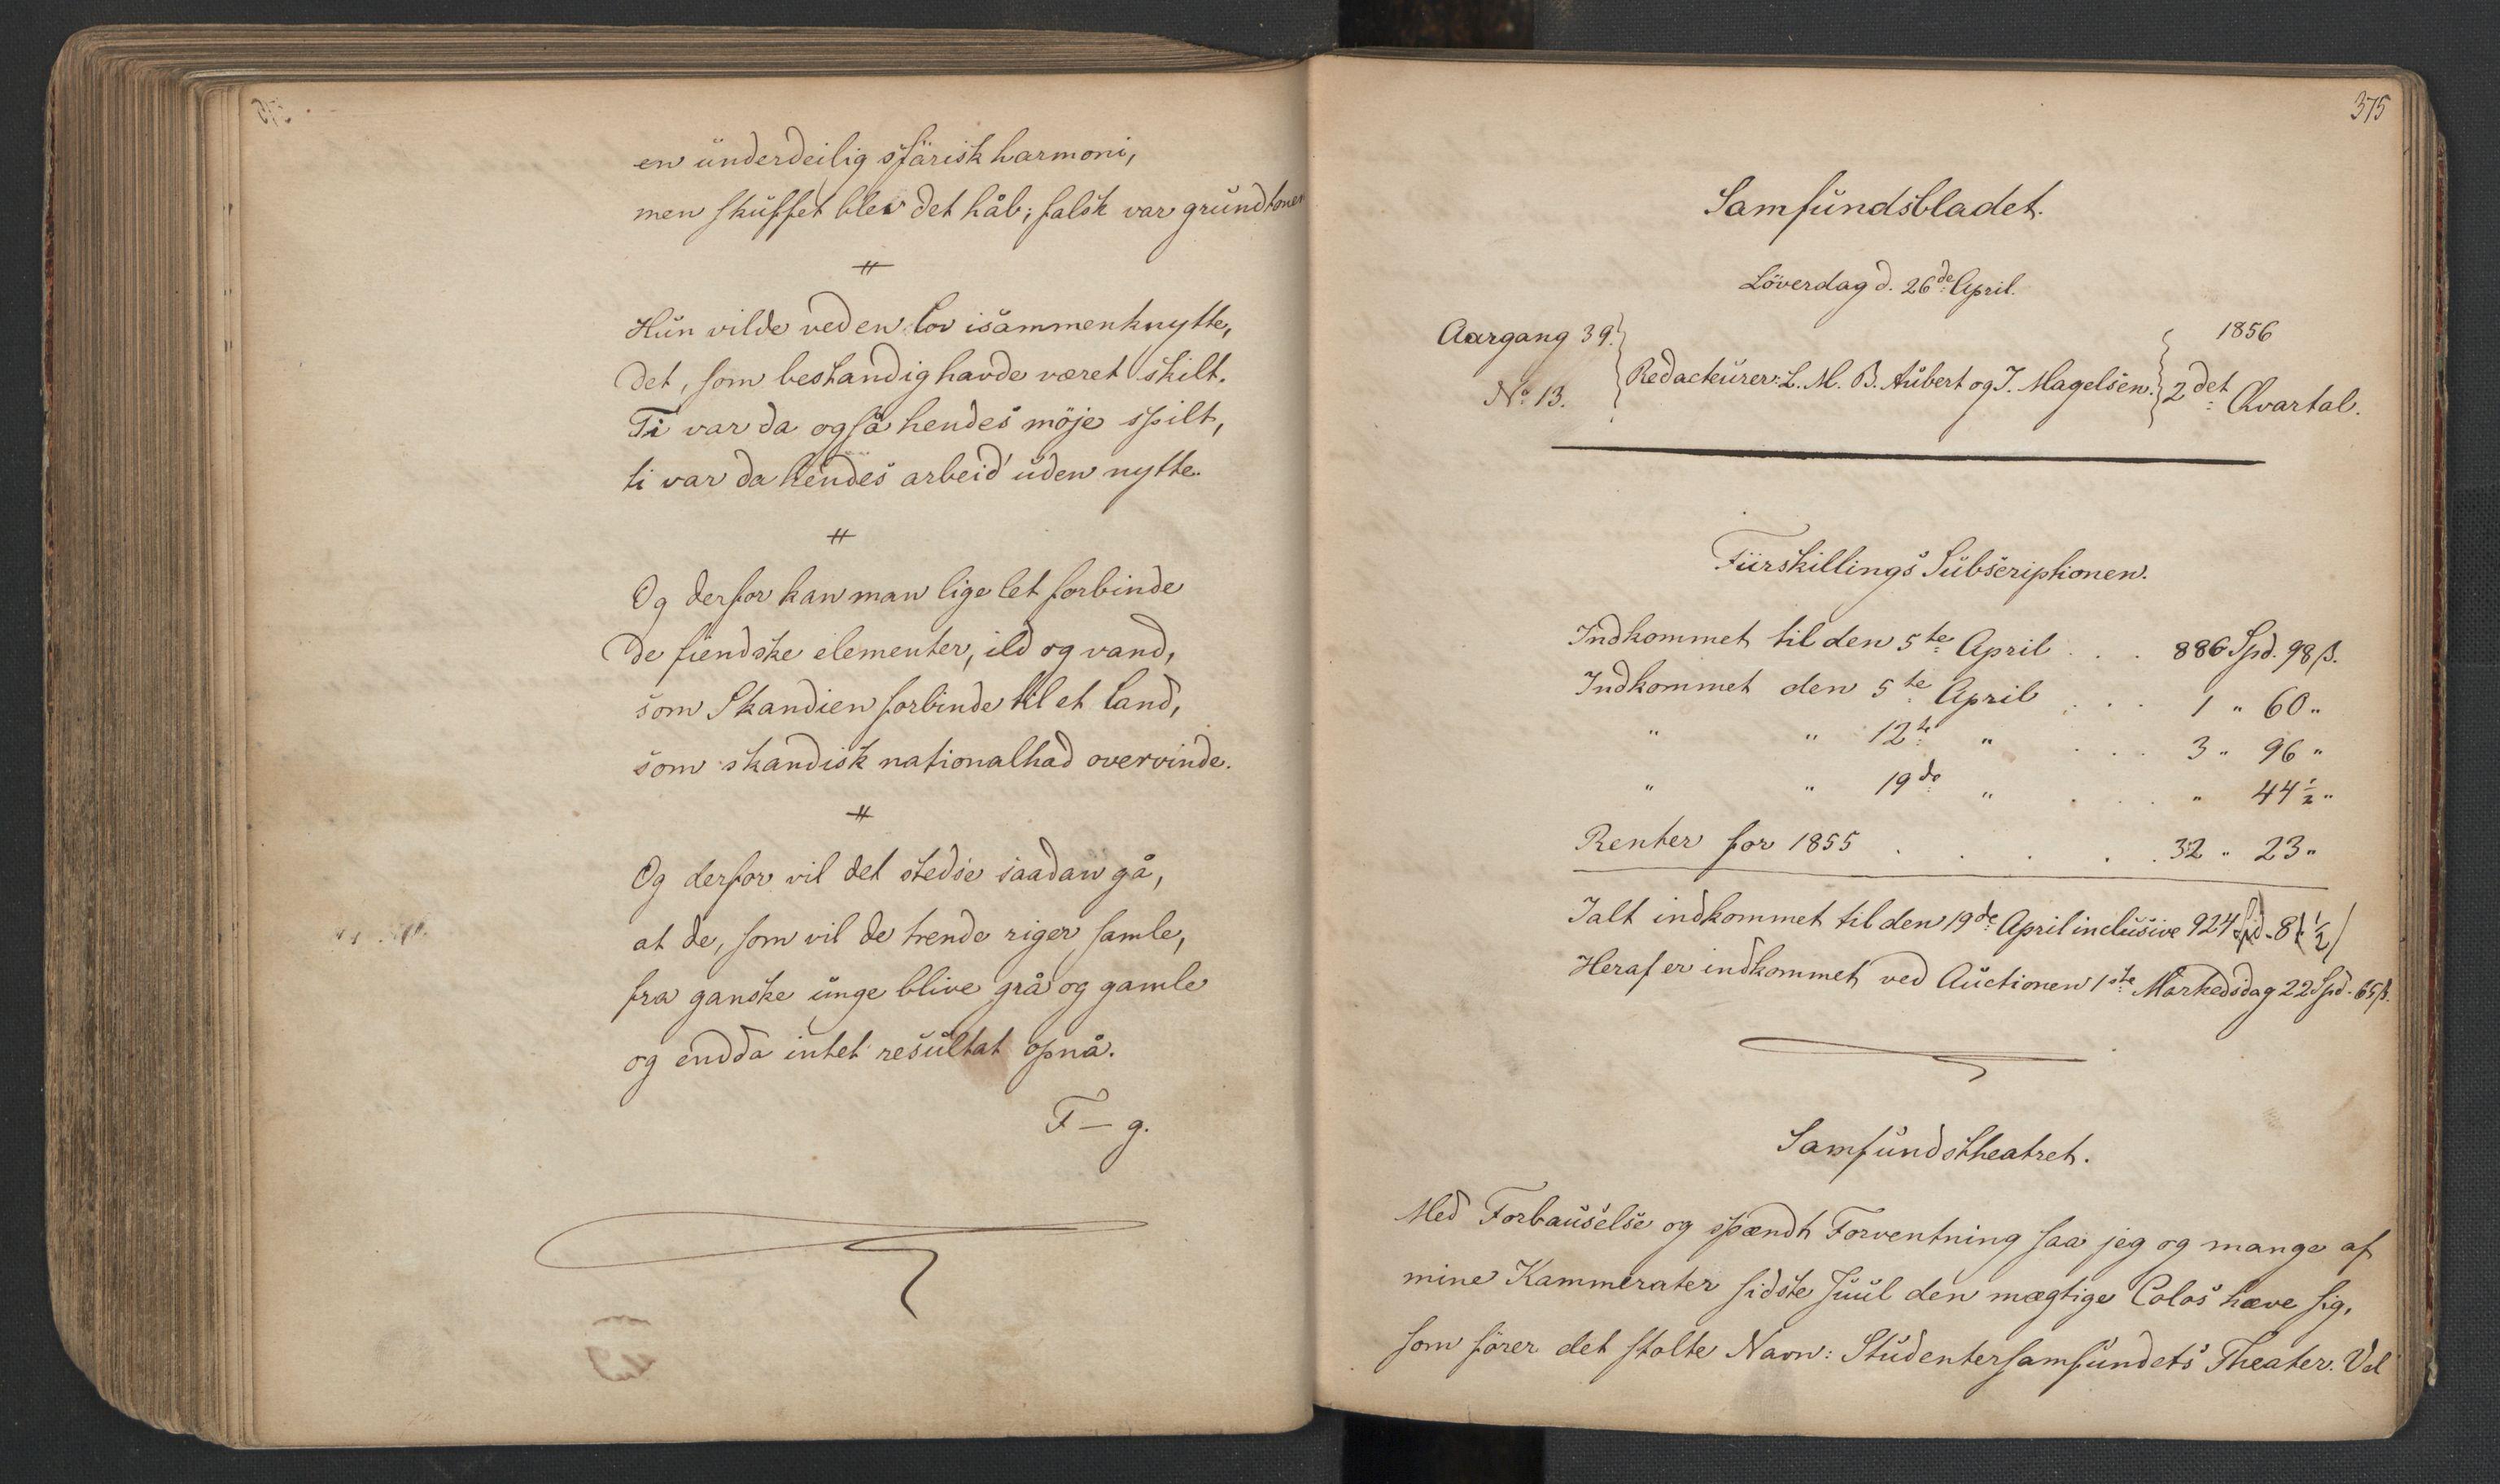 RA, Det Norske Studentersamfund, X/Xa/L0005, 1855-1856, s. 190